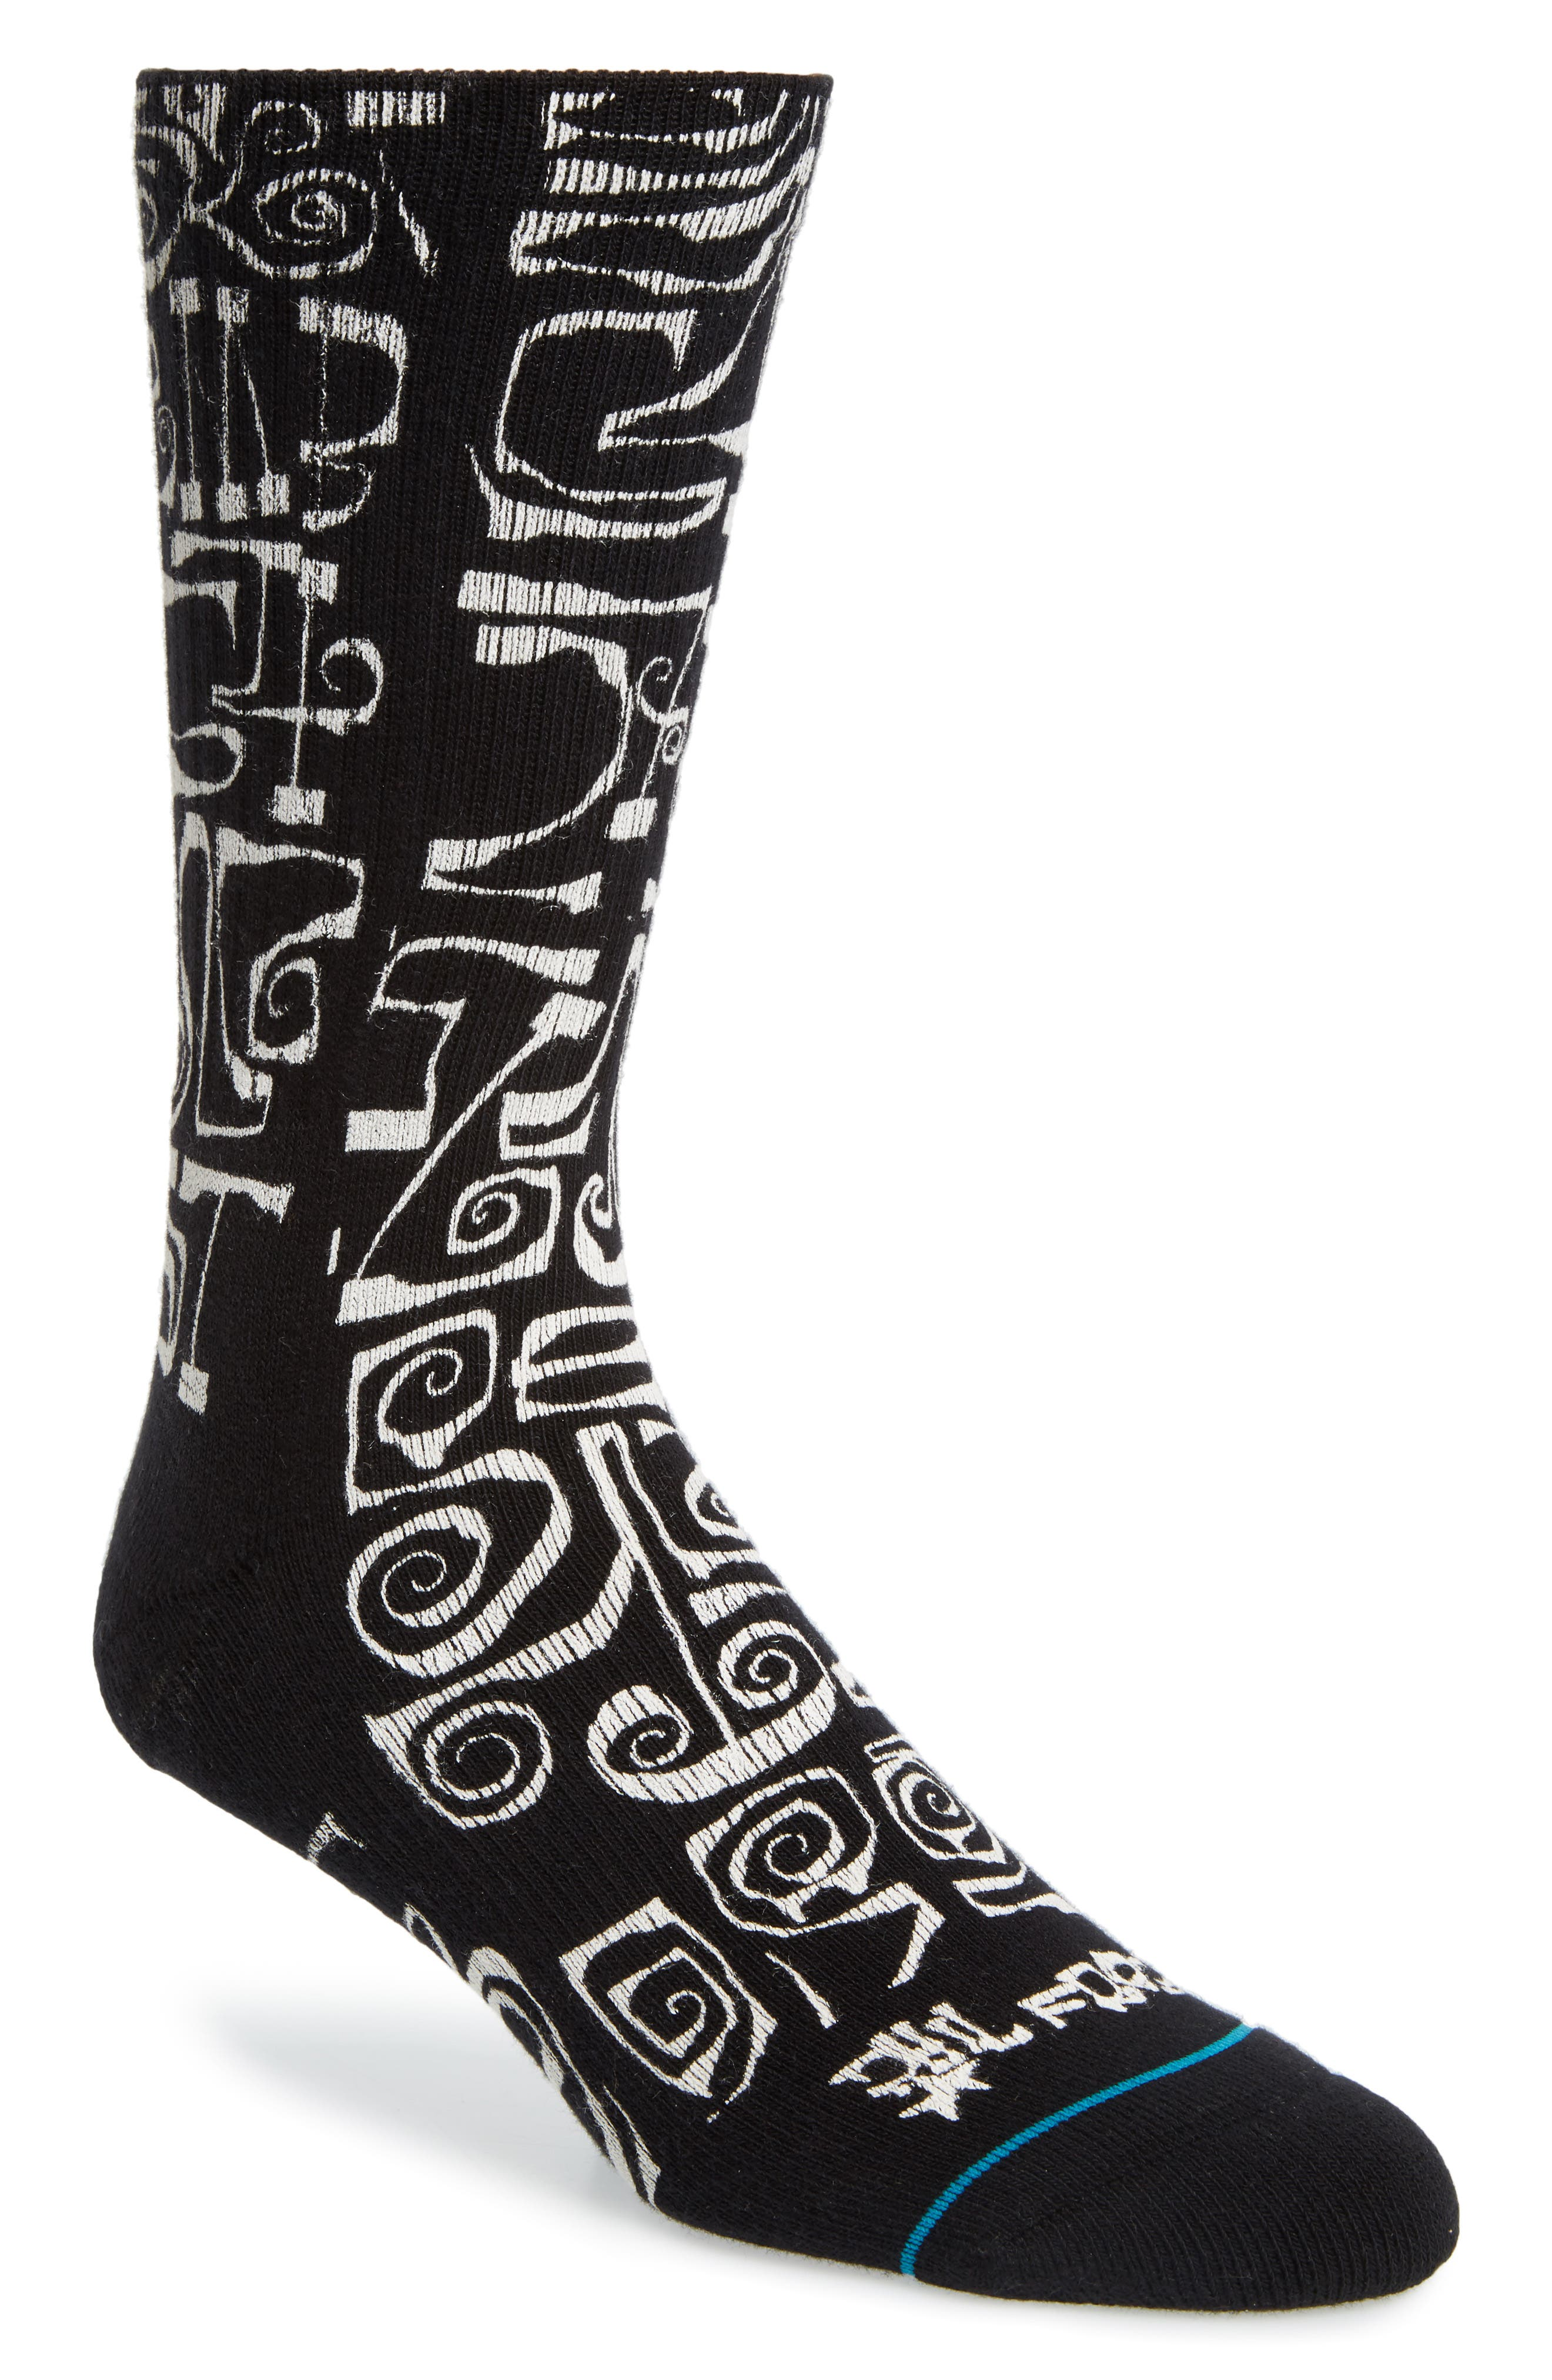 Frost Letters Socks,                             Main thumbnail 1, color,                             Black